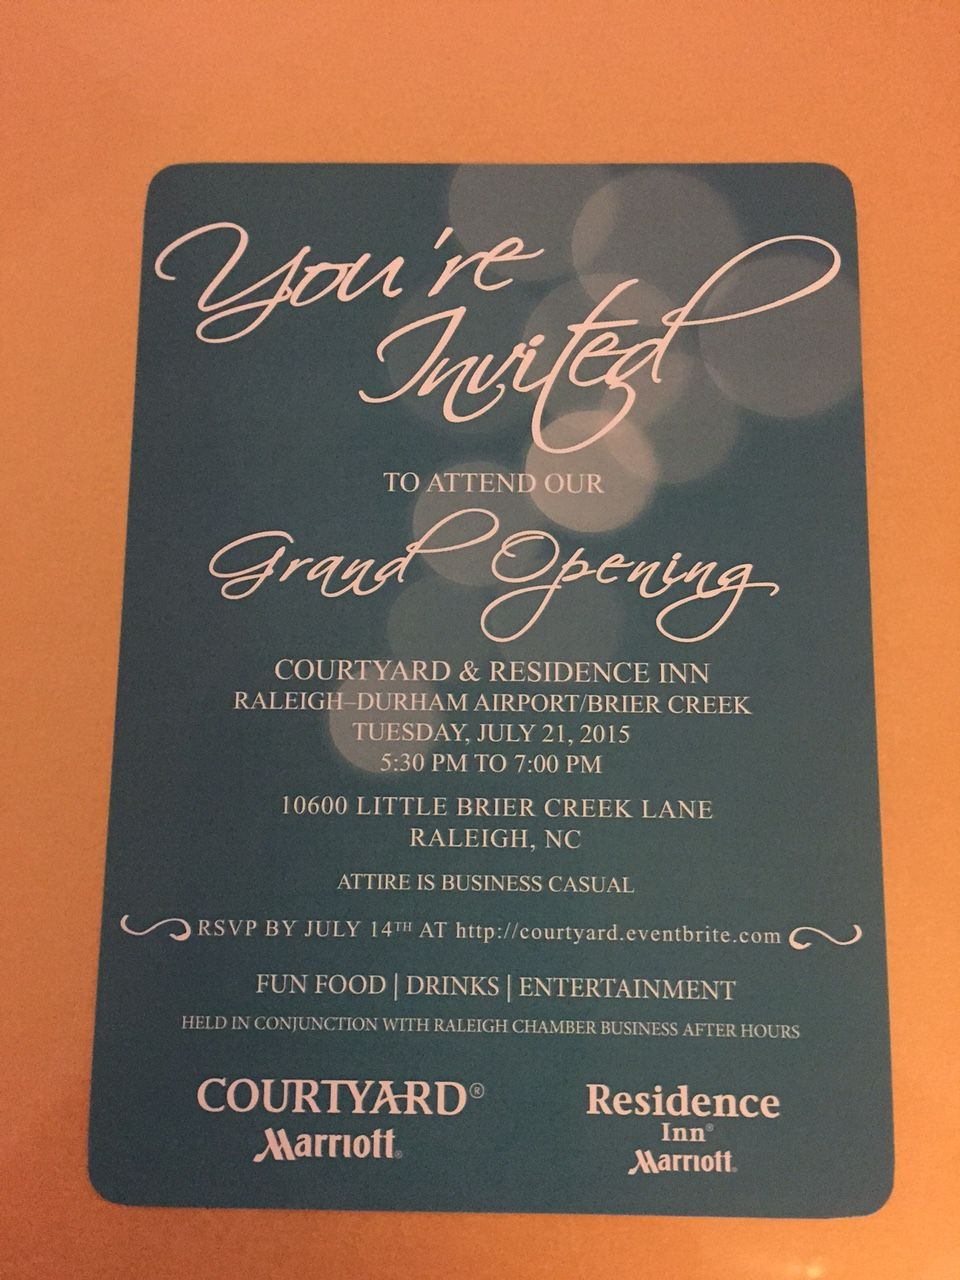 elegant invitation card design for a hotel grand opening